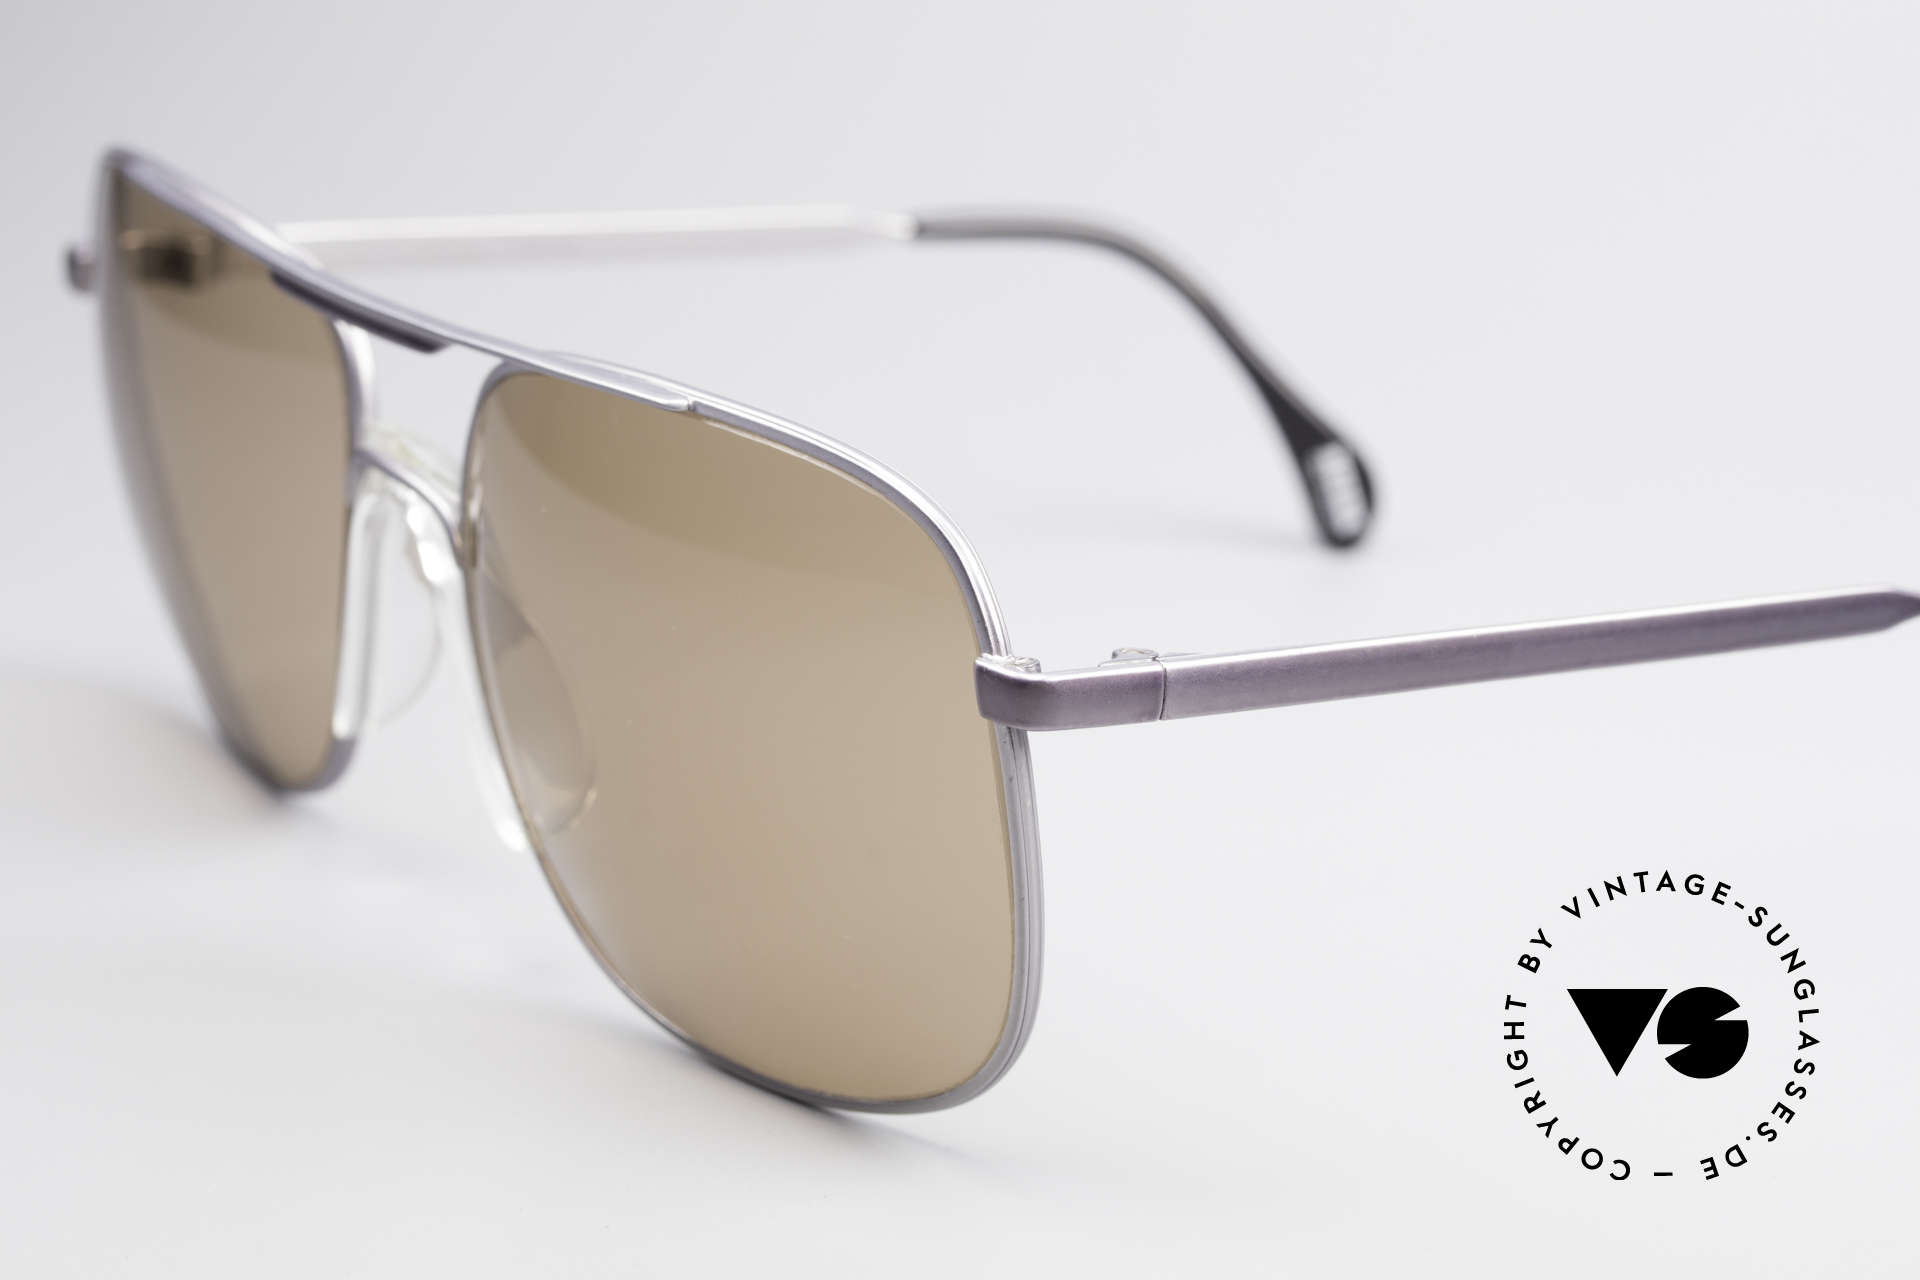 Zeiss 9311 Mineral Lenses 80s Sunglasses, high-end mineral lenses (scratch-resistant & 100% UV), Made for Men